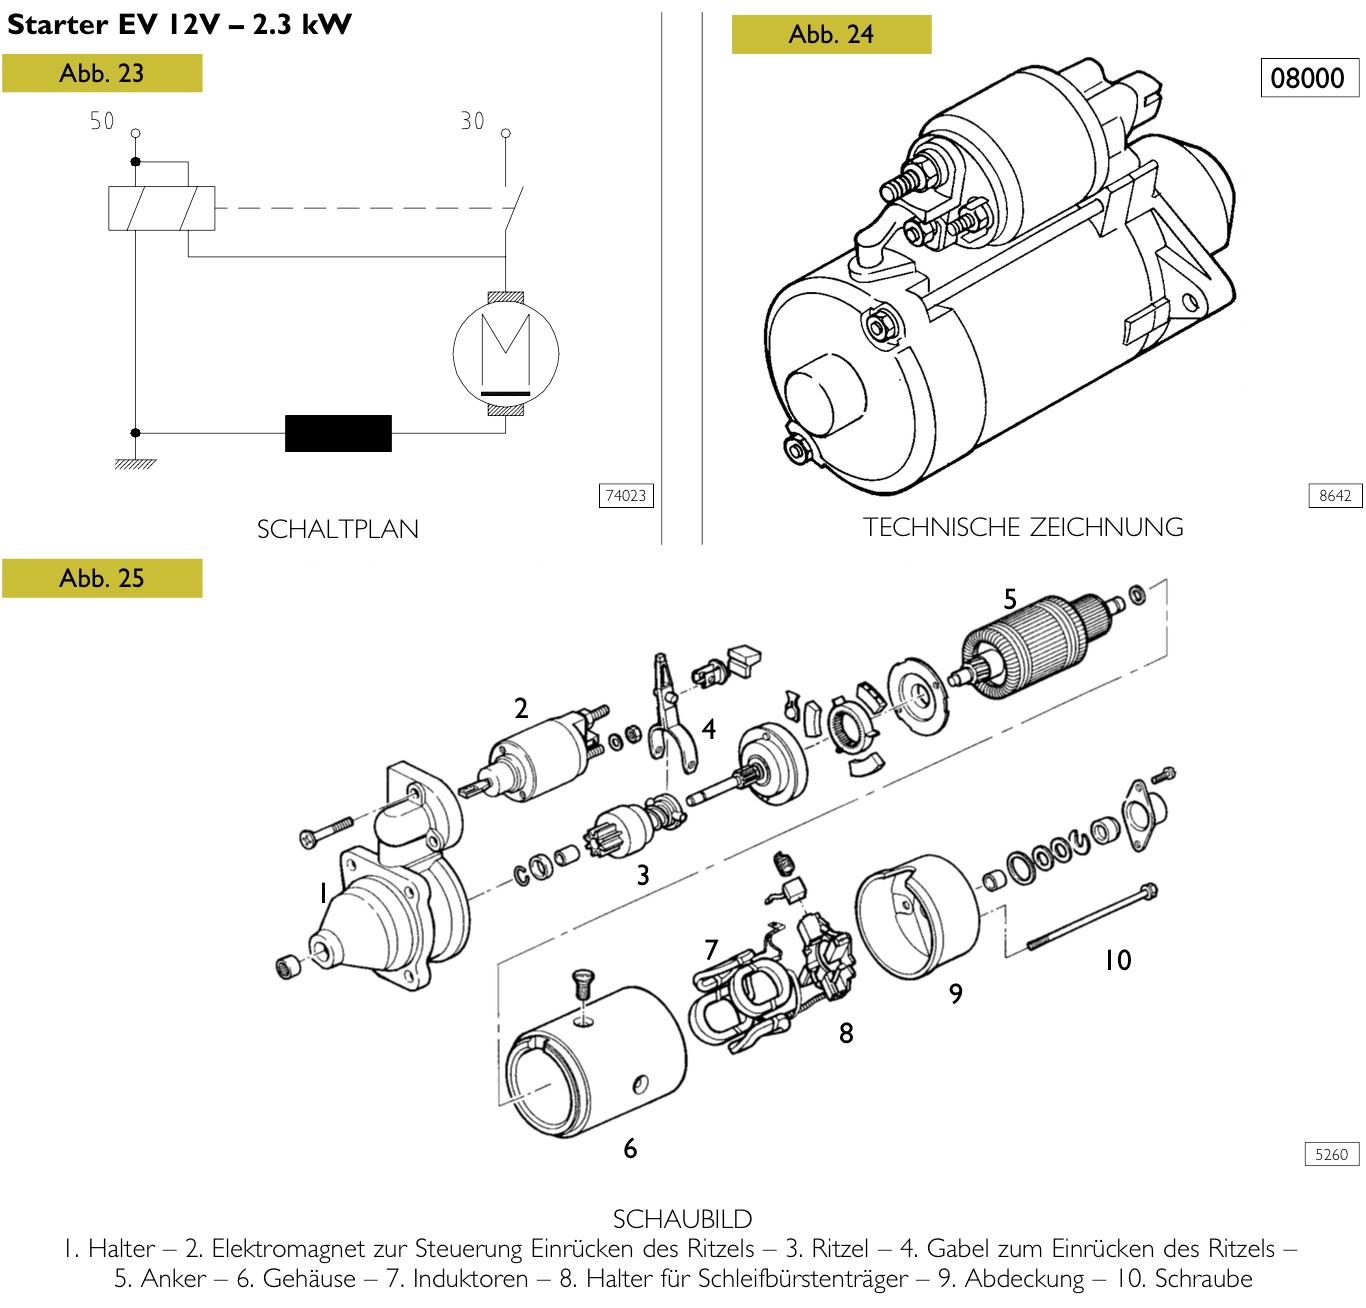 Hunky-Dory 4WDing: Chronologie einer Elektrikpanne